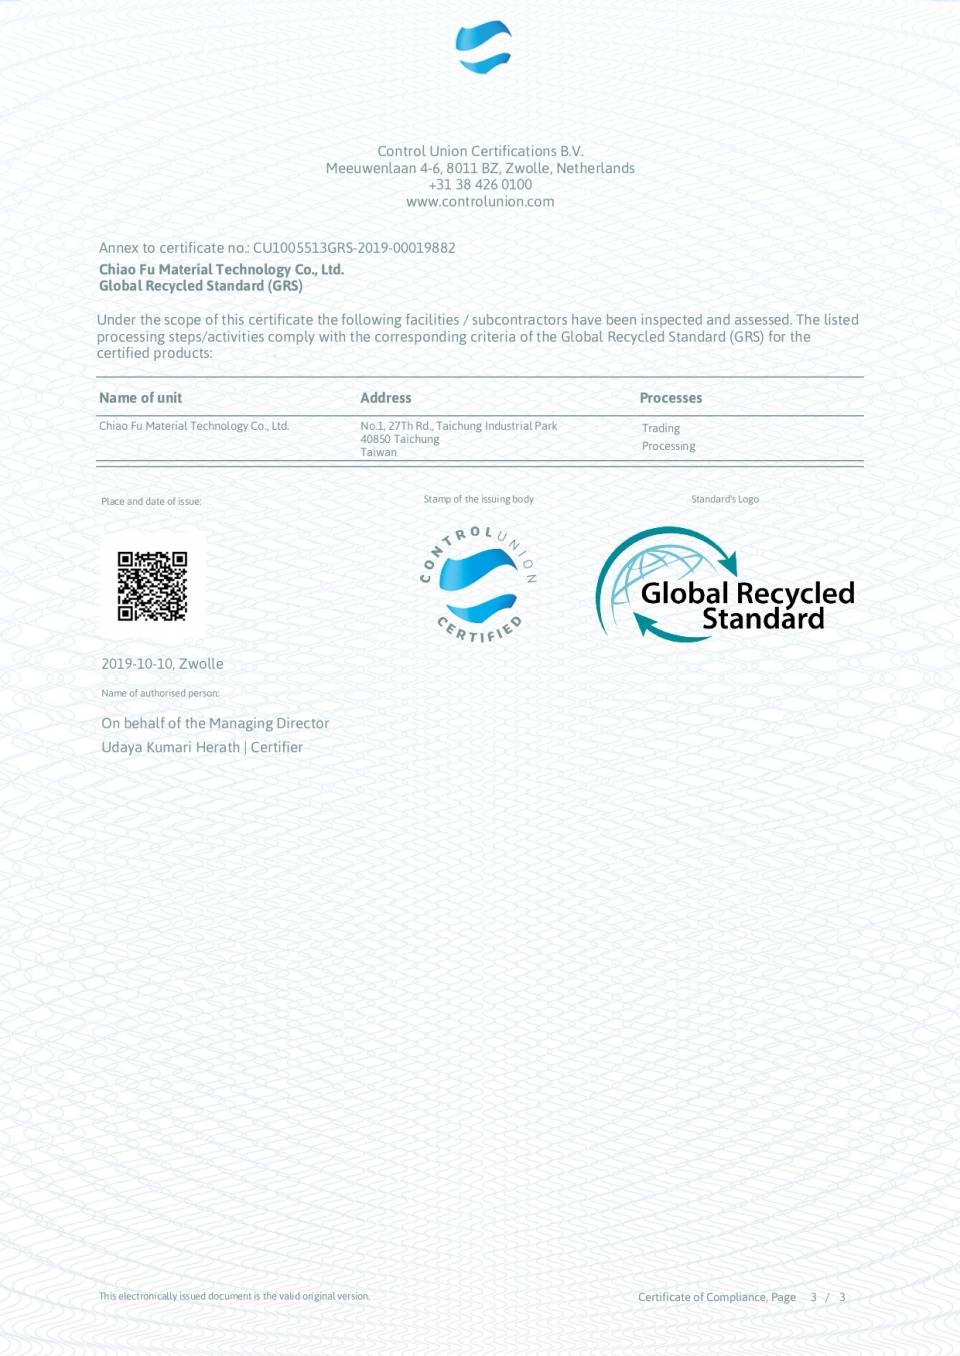 GRS_Scope_Certificate_2019-10-10 13_12_26 UTC_page-0003